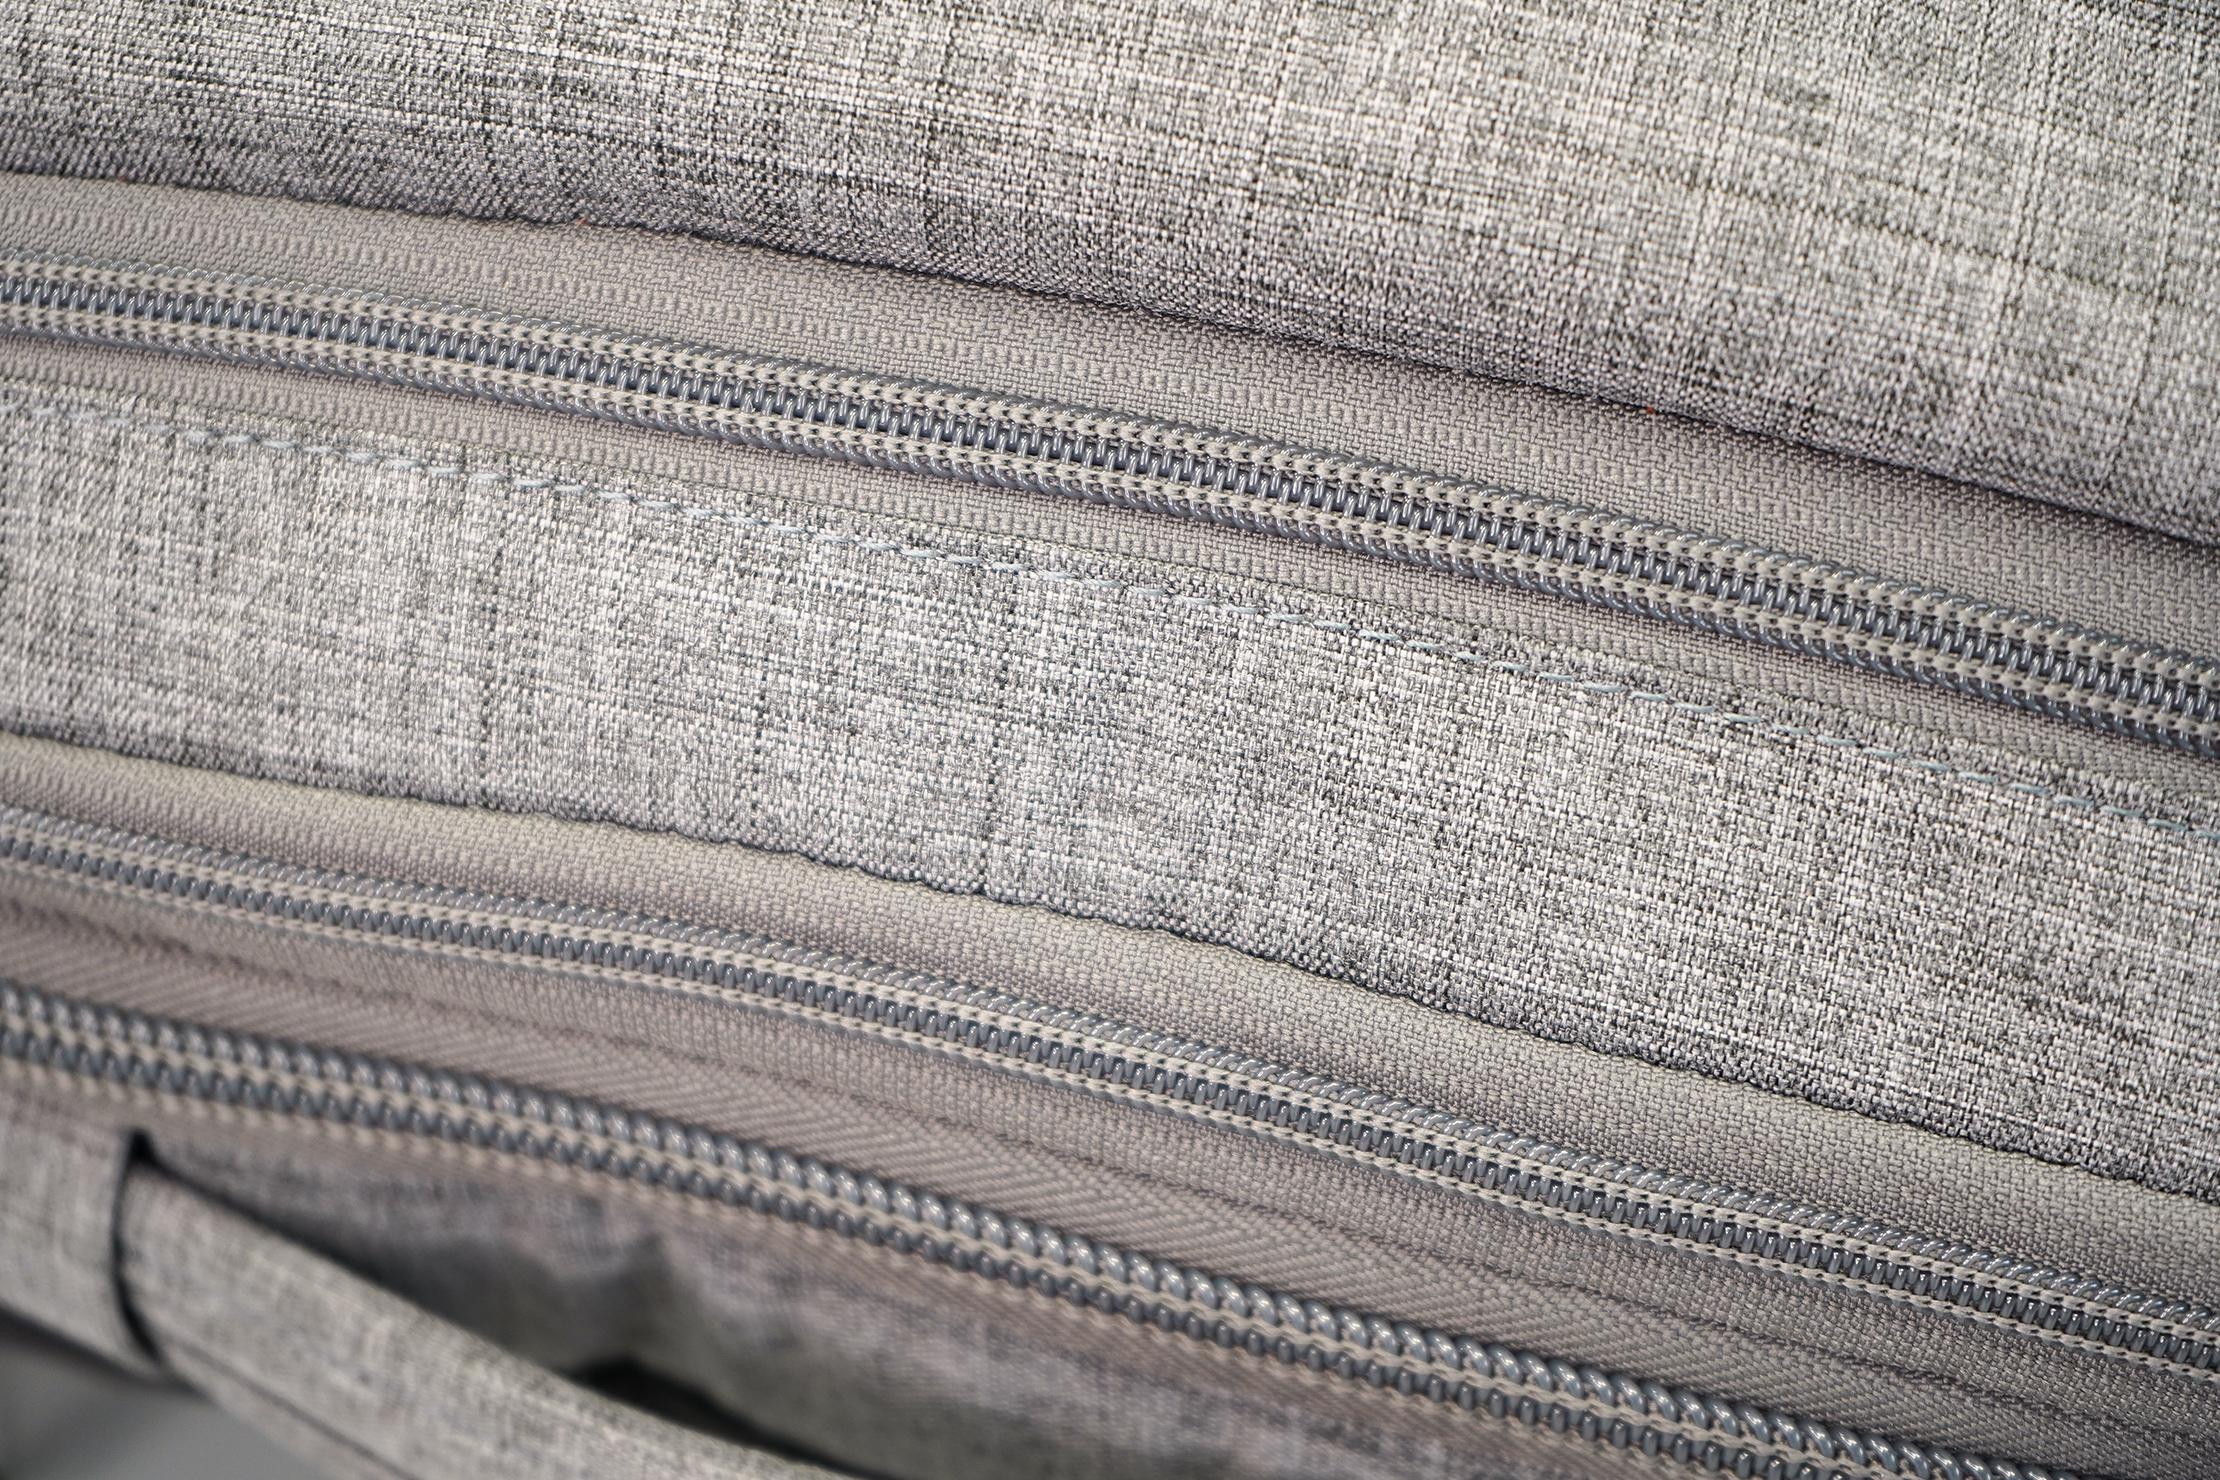 AmazonBasics Slim Travel Backpack Weekender Exposed Zipper Coil